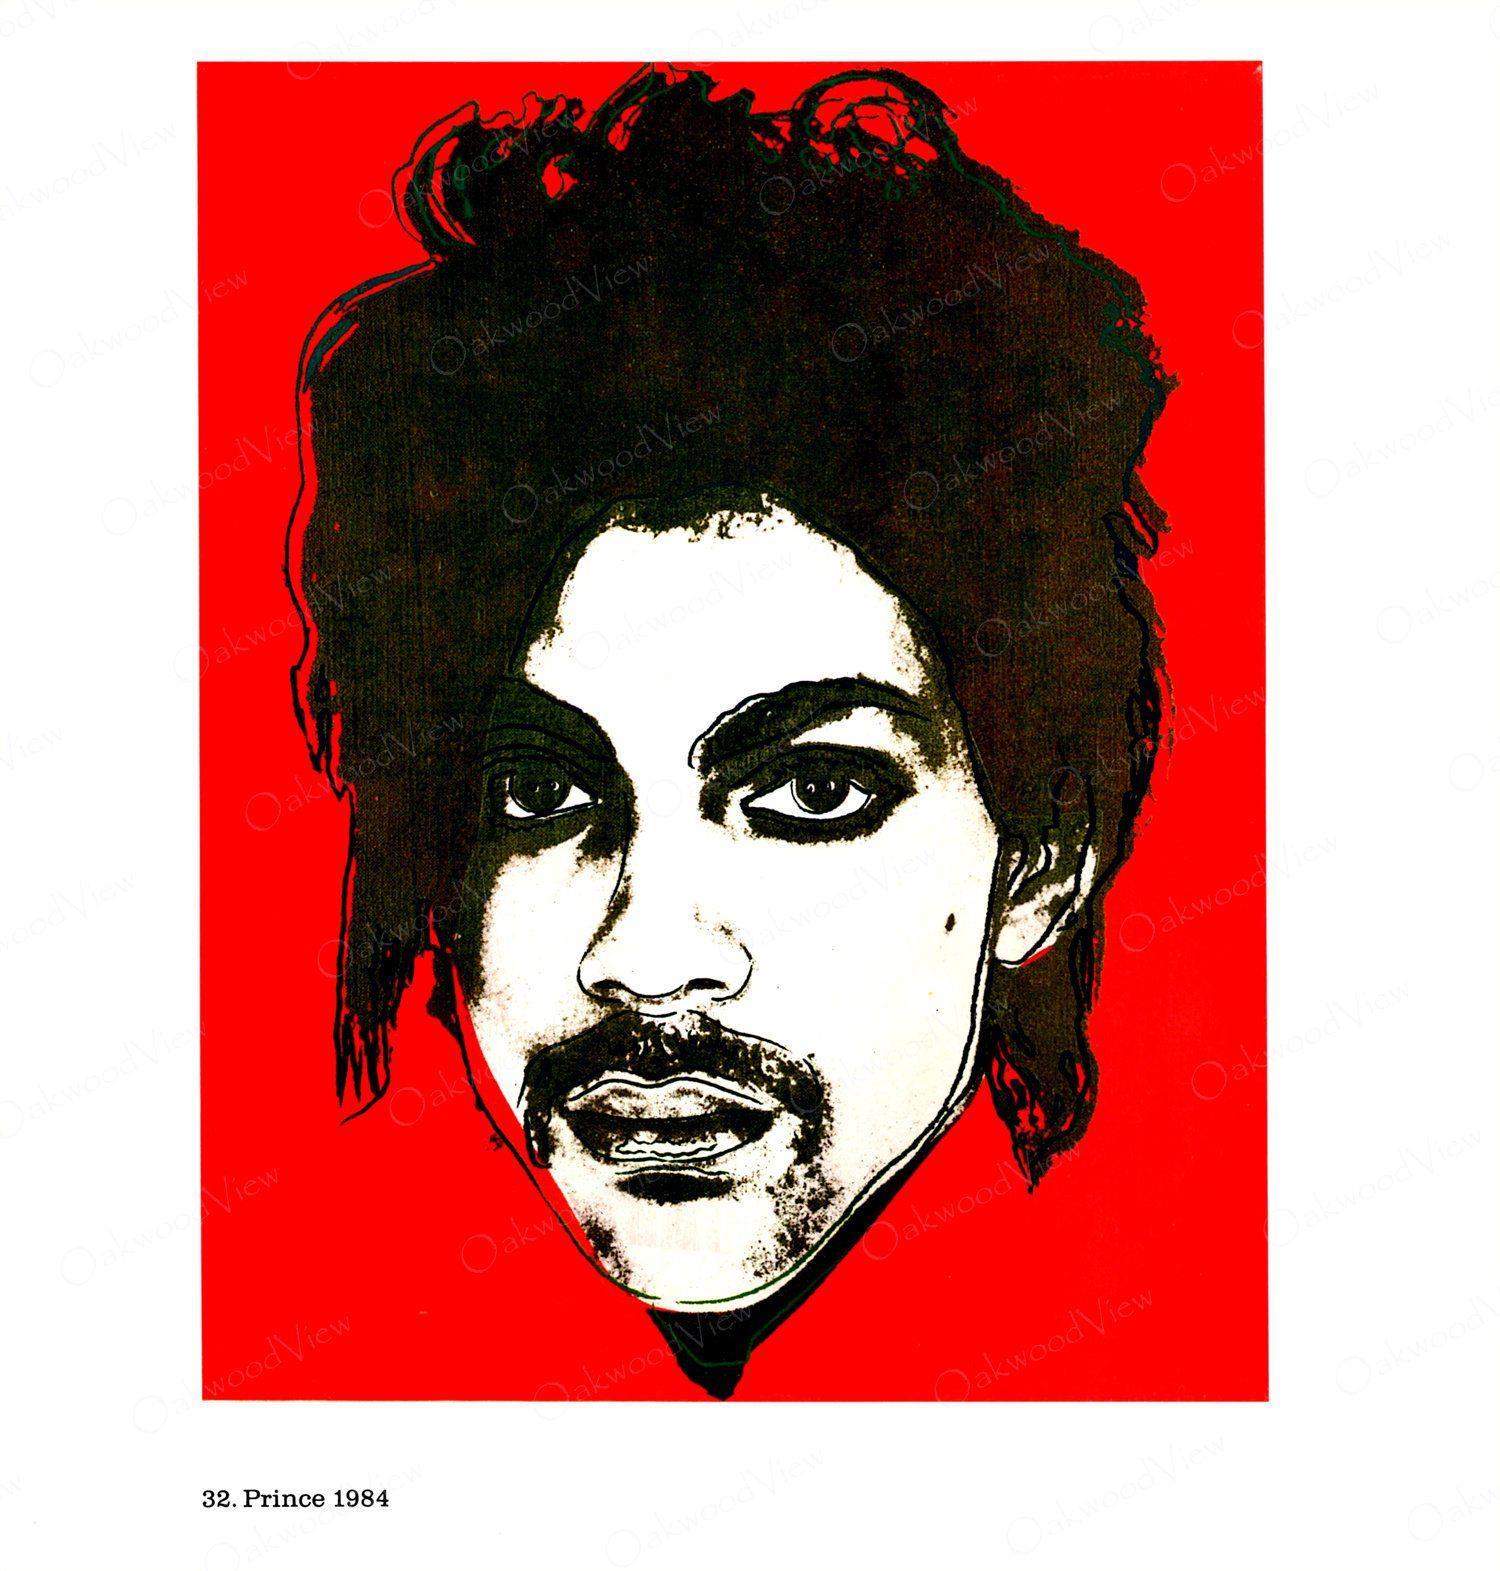 Andy warhol prince 1 rock star rb singer musician